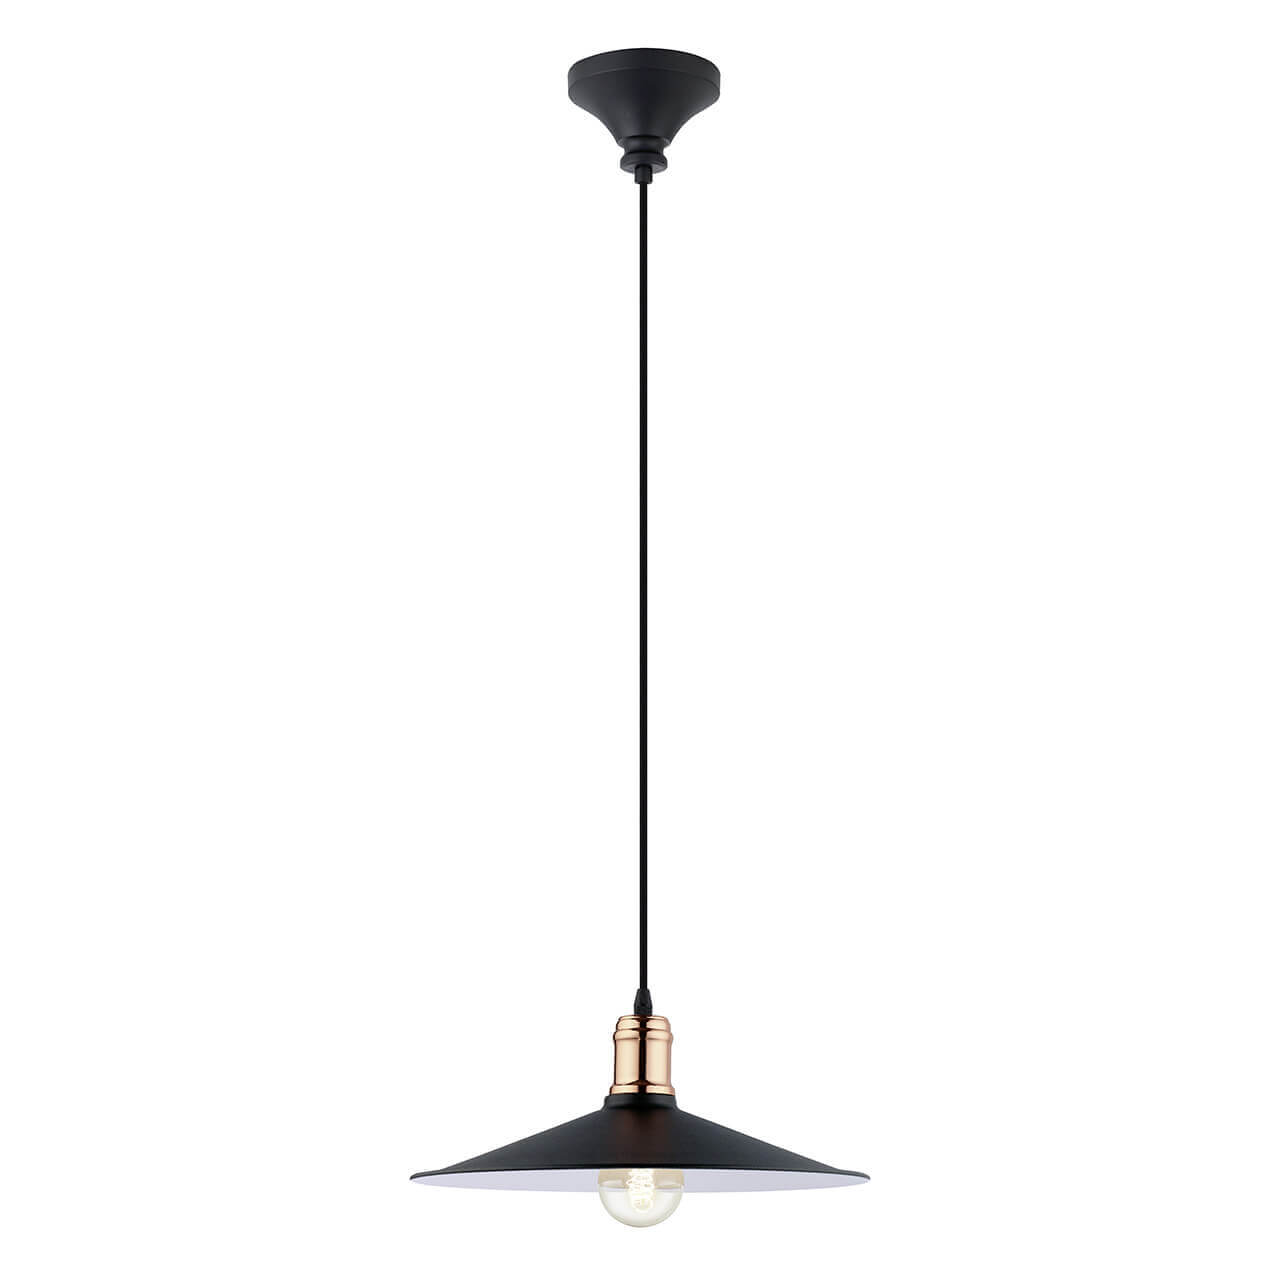 Светильник Eglo 49452 Bridport